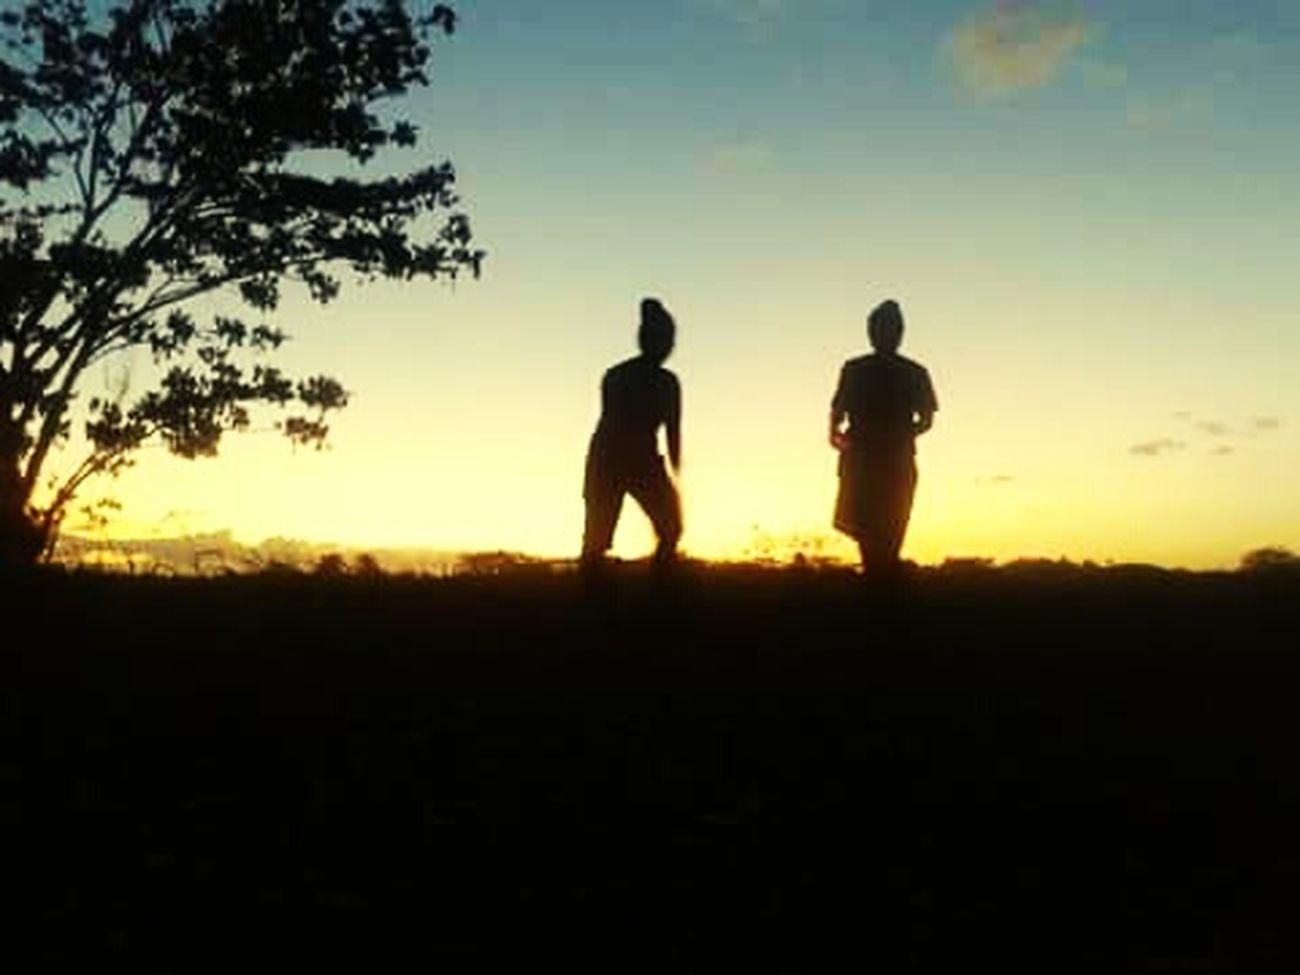 Photography In Motion Fiji Sunset Eyem Nature Lovers  EyeEm Best Edits Eyemfiji EyeEm